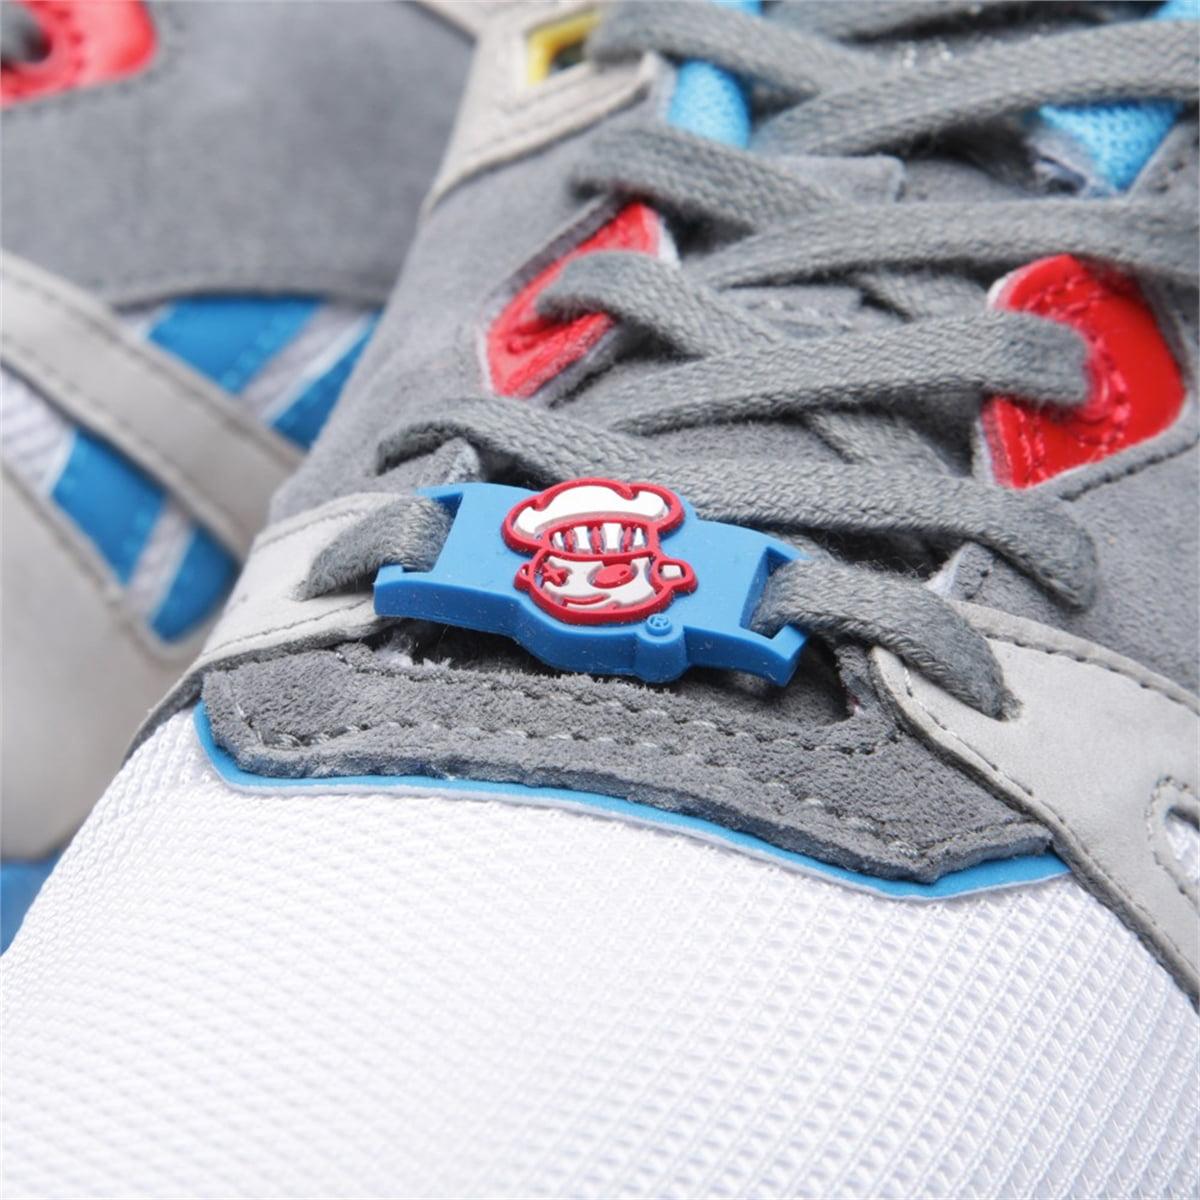 Reebok Men Ventilator Cnt Sneaker Economical, stylish, and eye-catching shoes